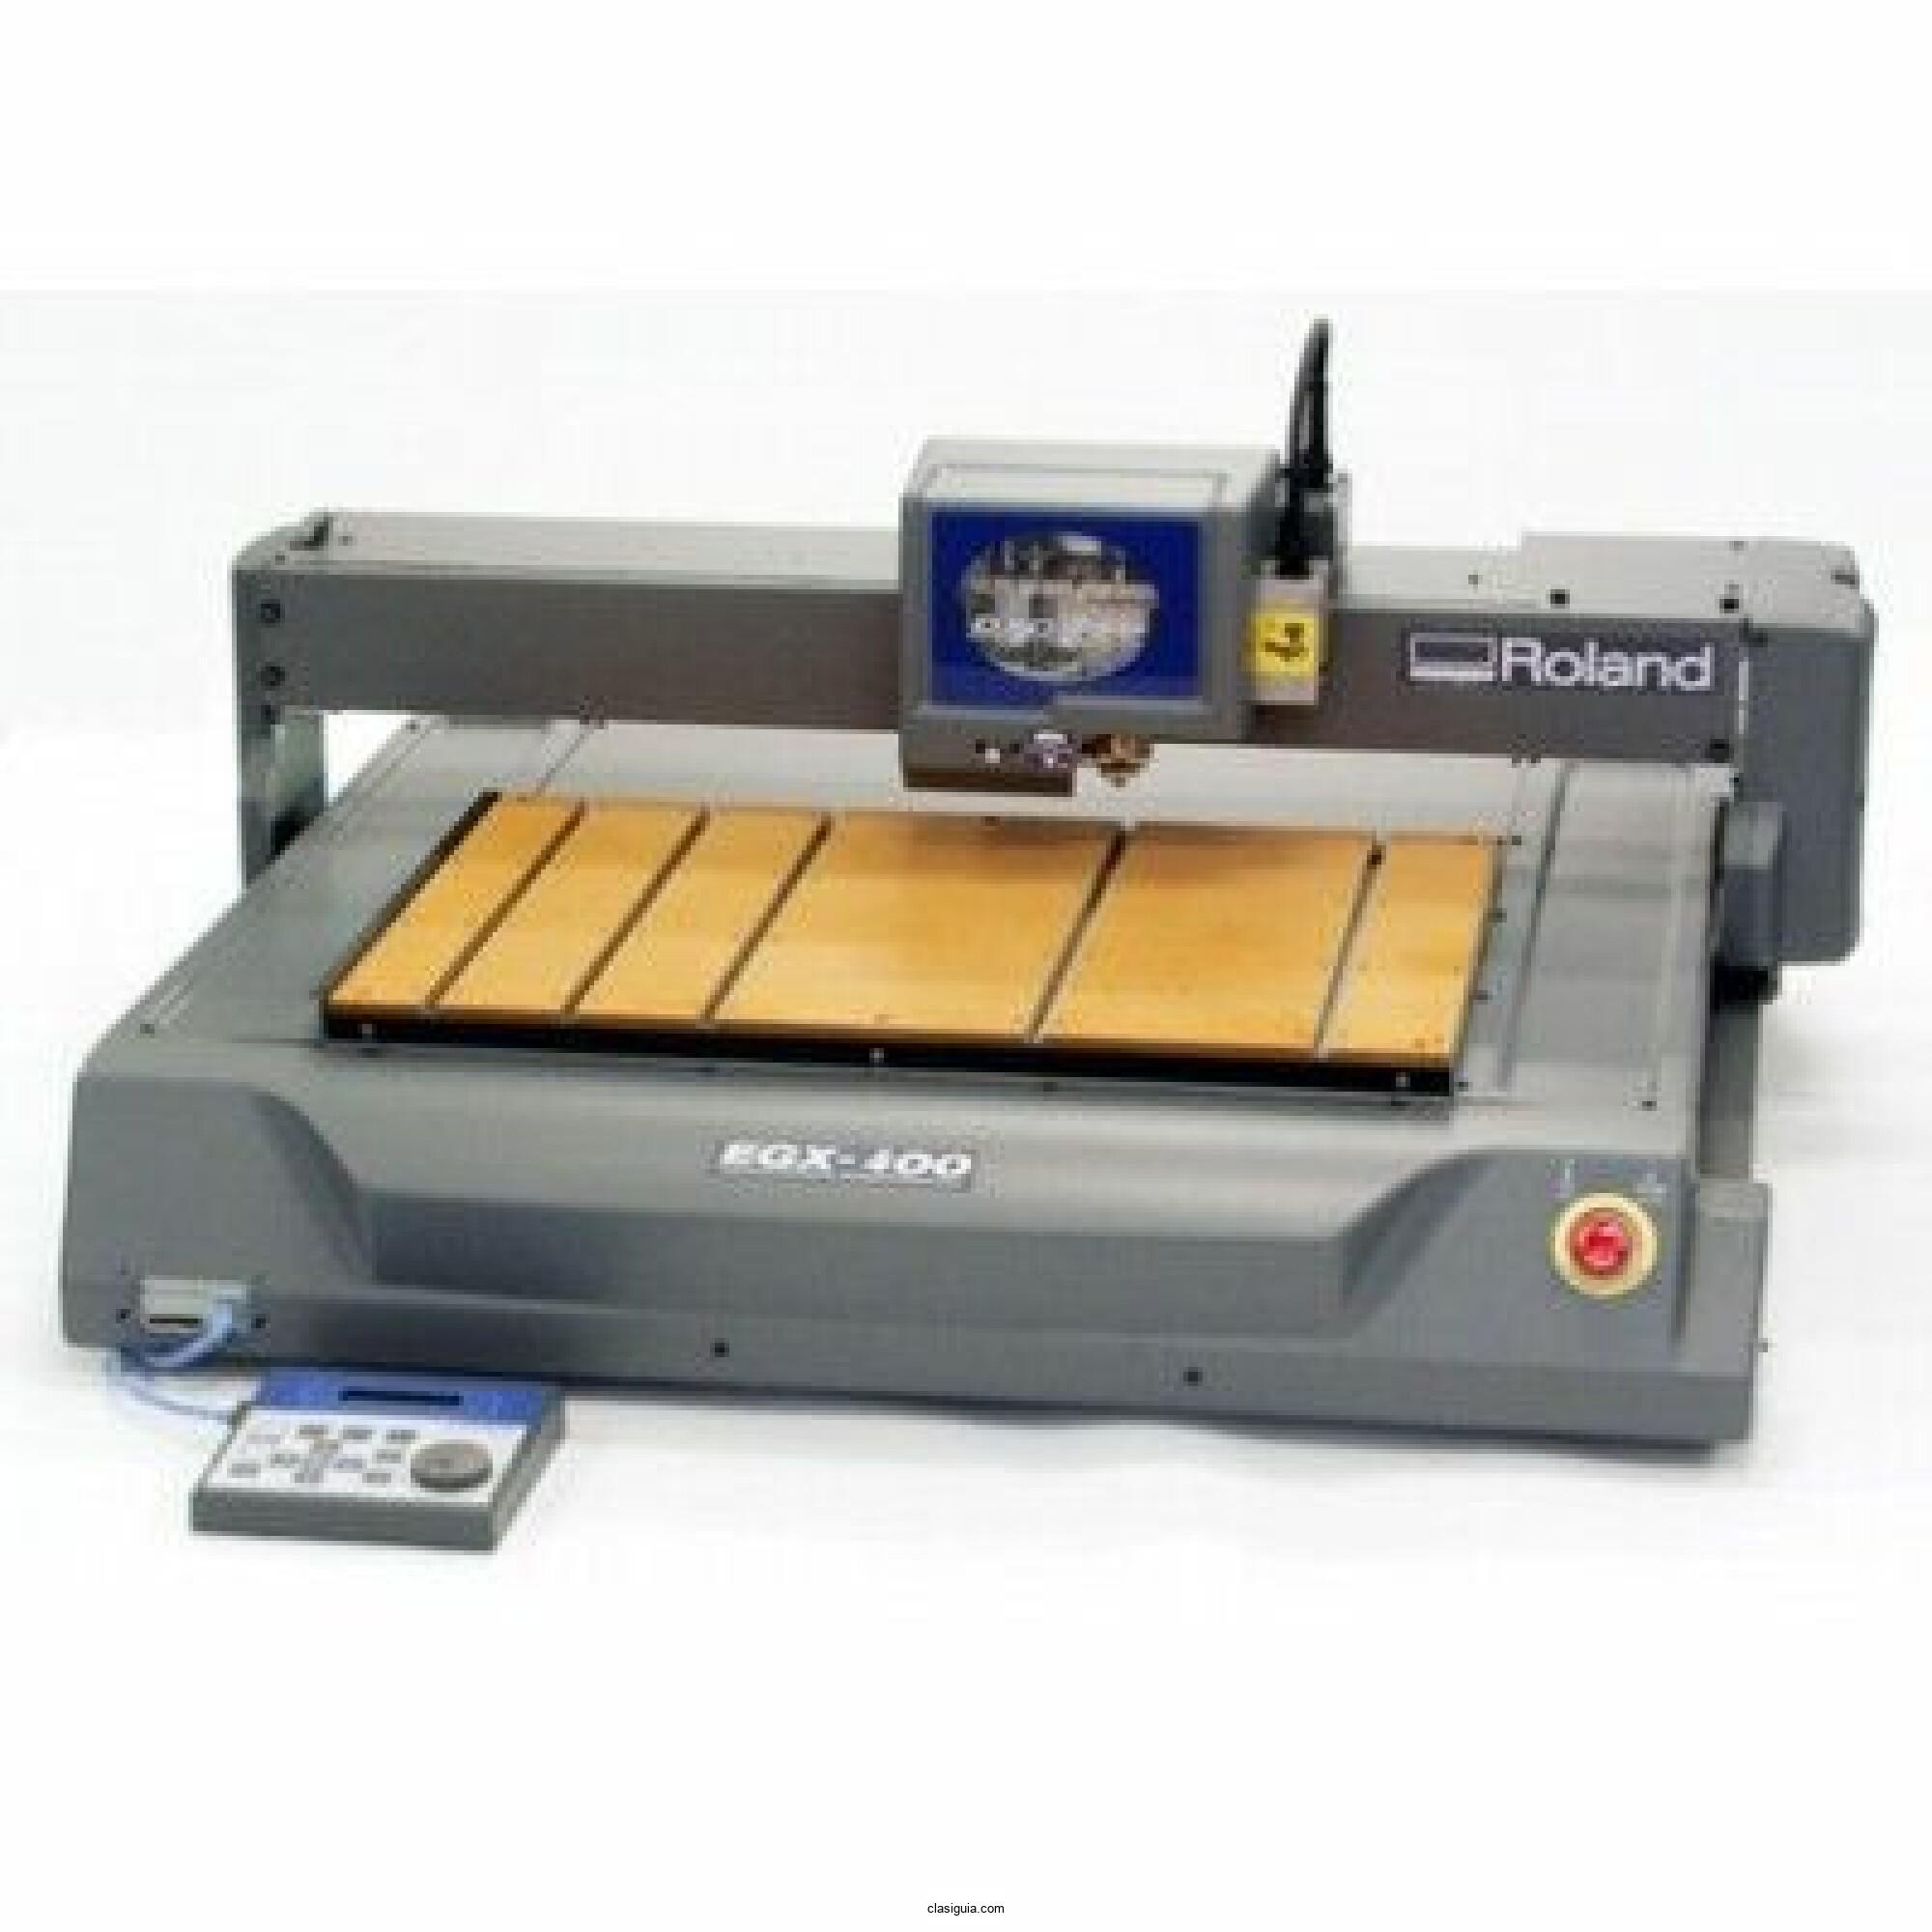 Roland EGX-400 CNC Engraving Machines (MITRA PRINT)